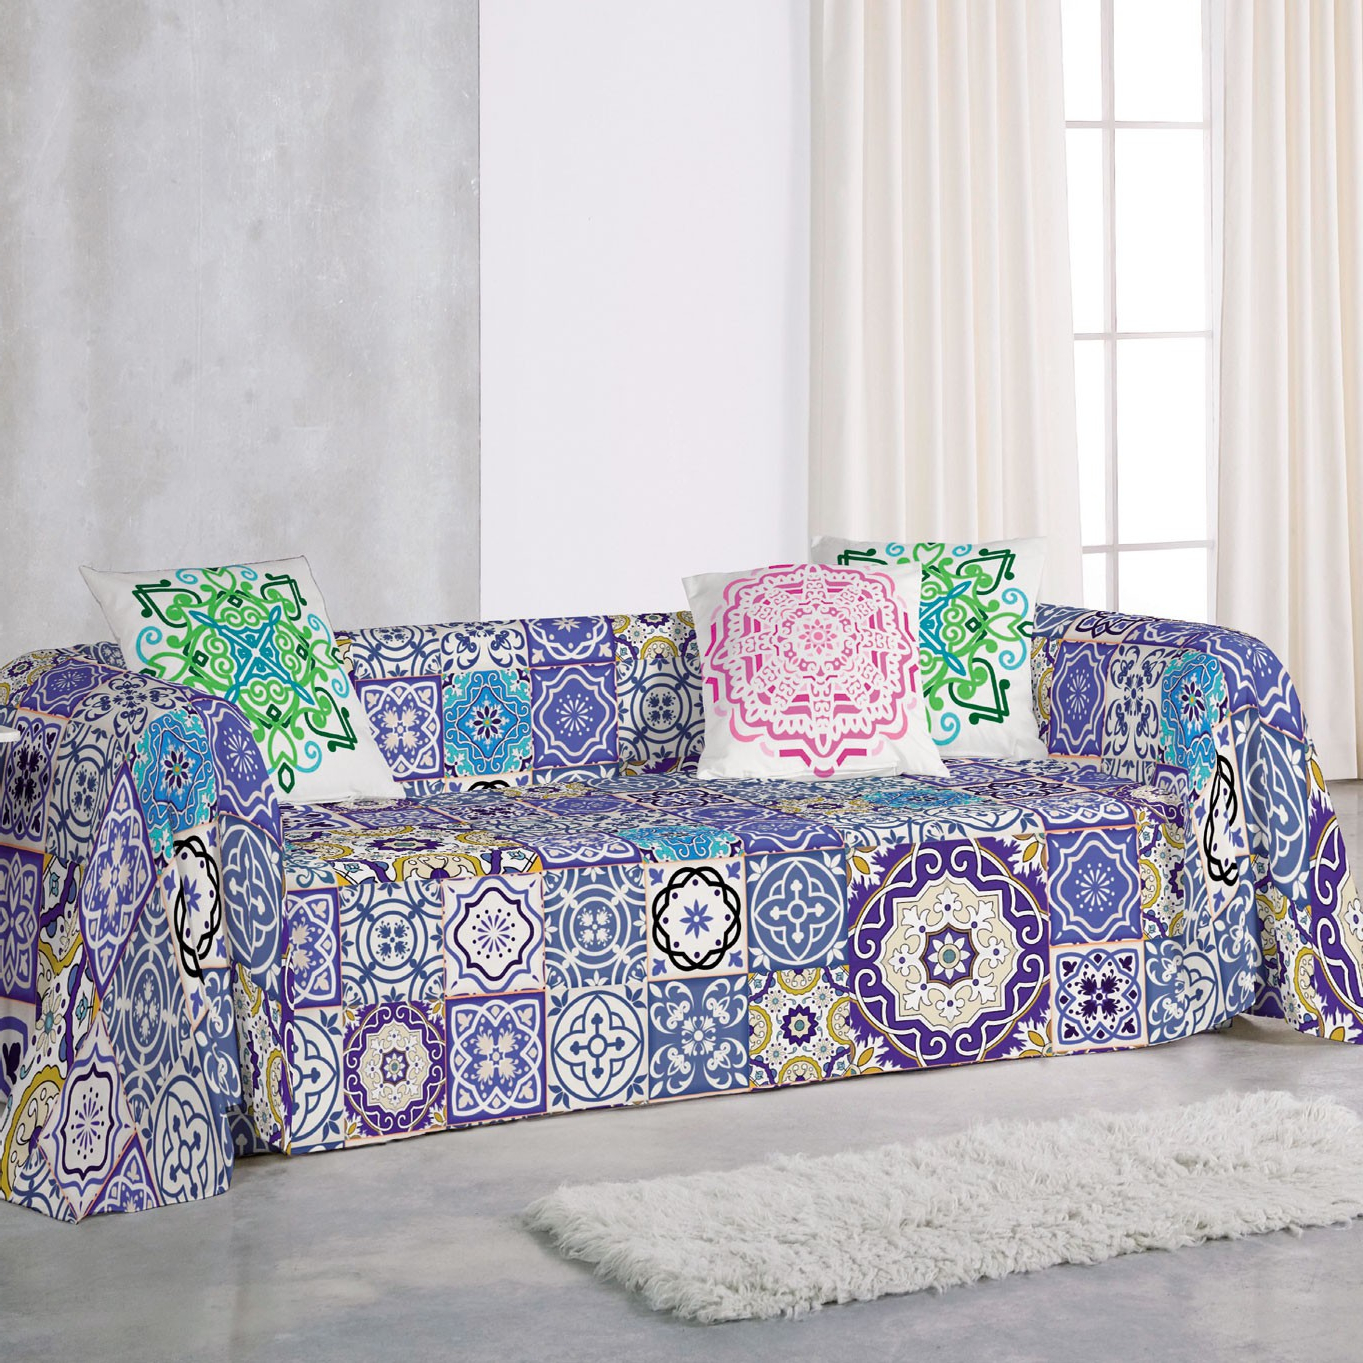 Colcha sofa Xtd6 Foulard Manisa